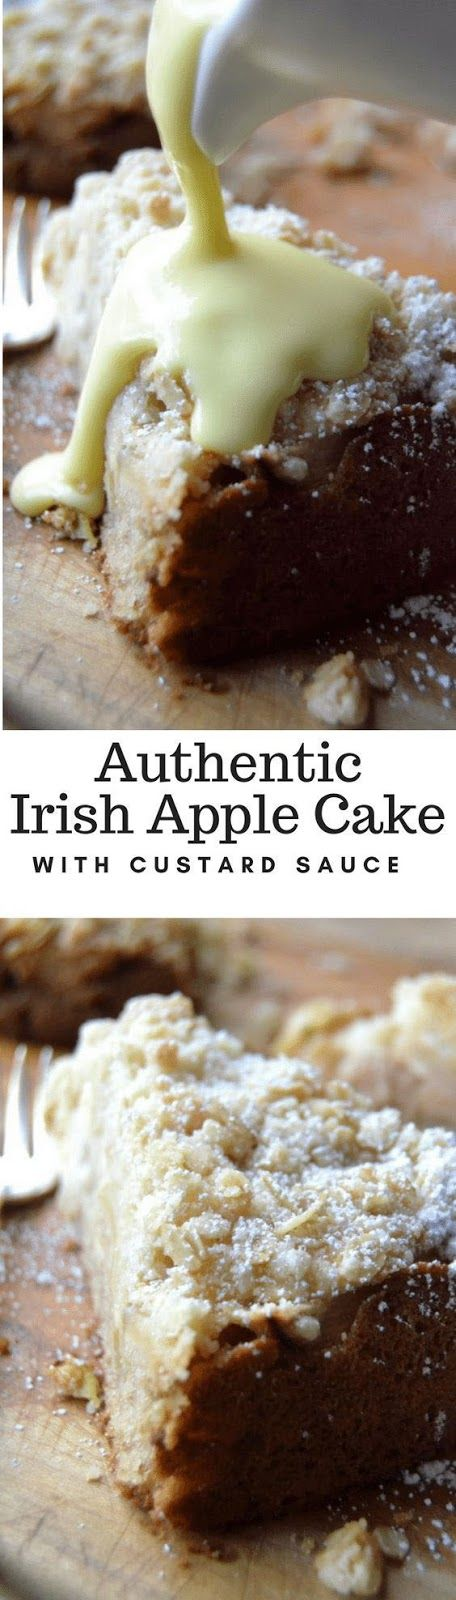 Authentic Irish Apple Cake With Custard Sauce cakerecipes